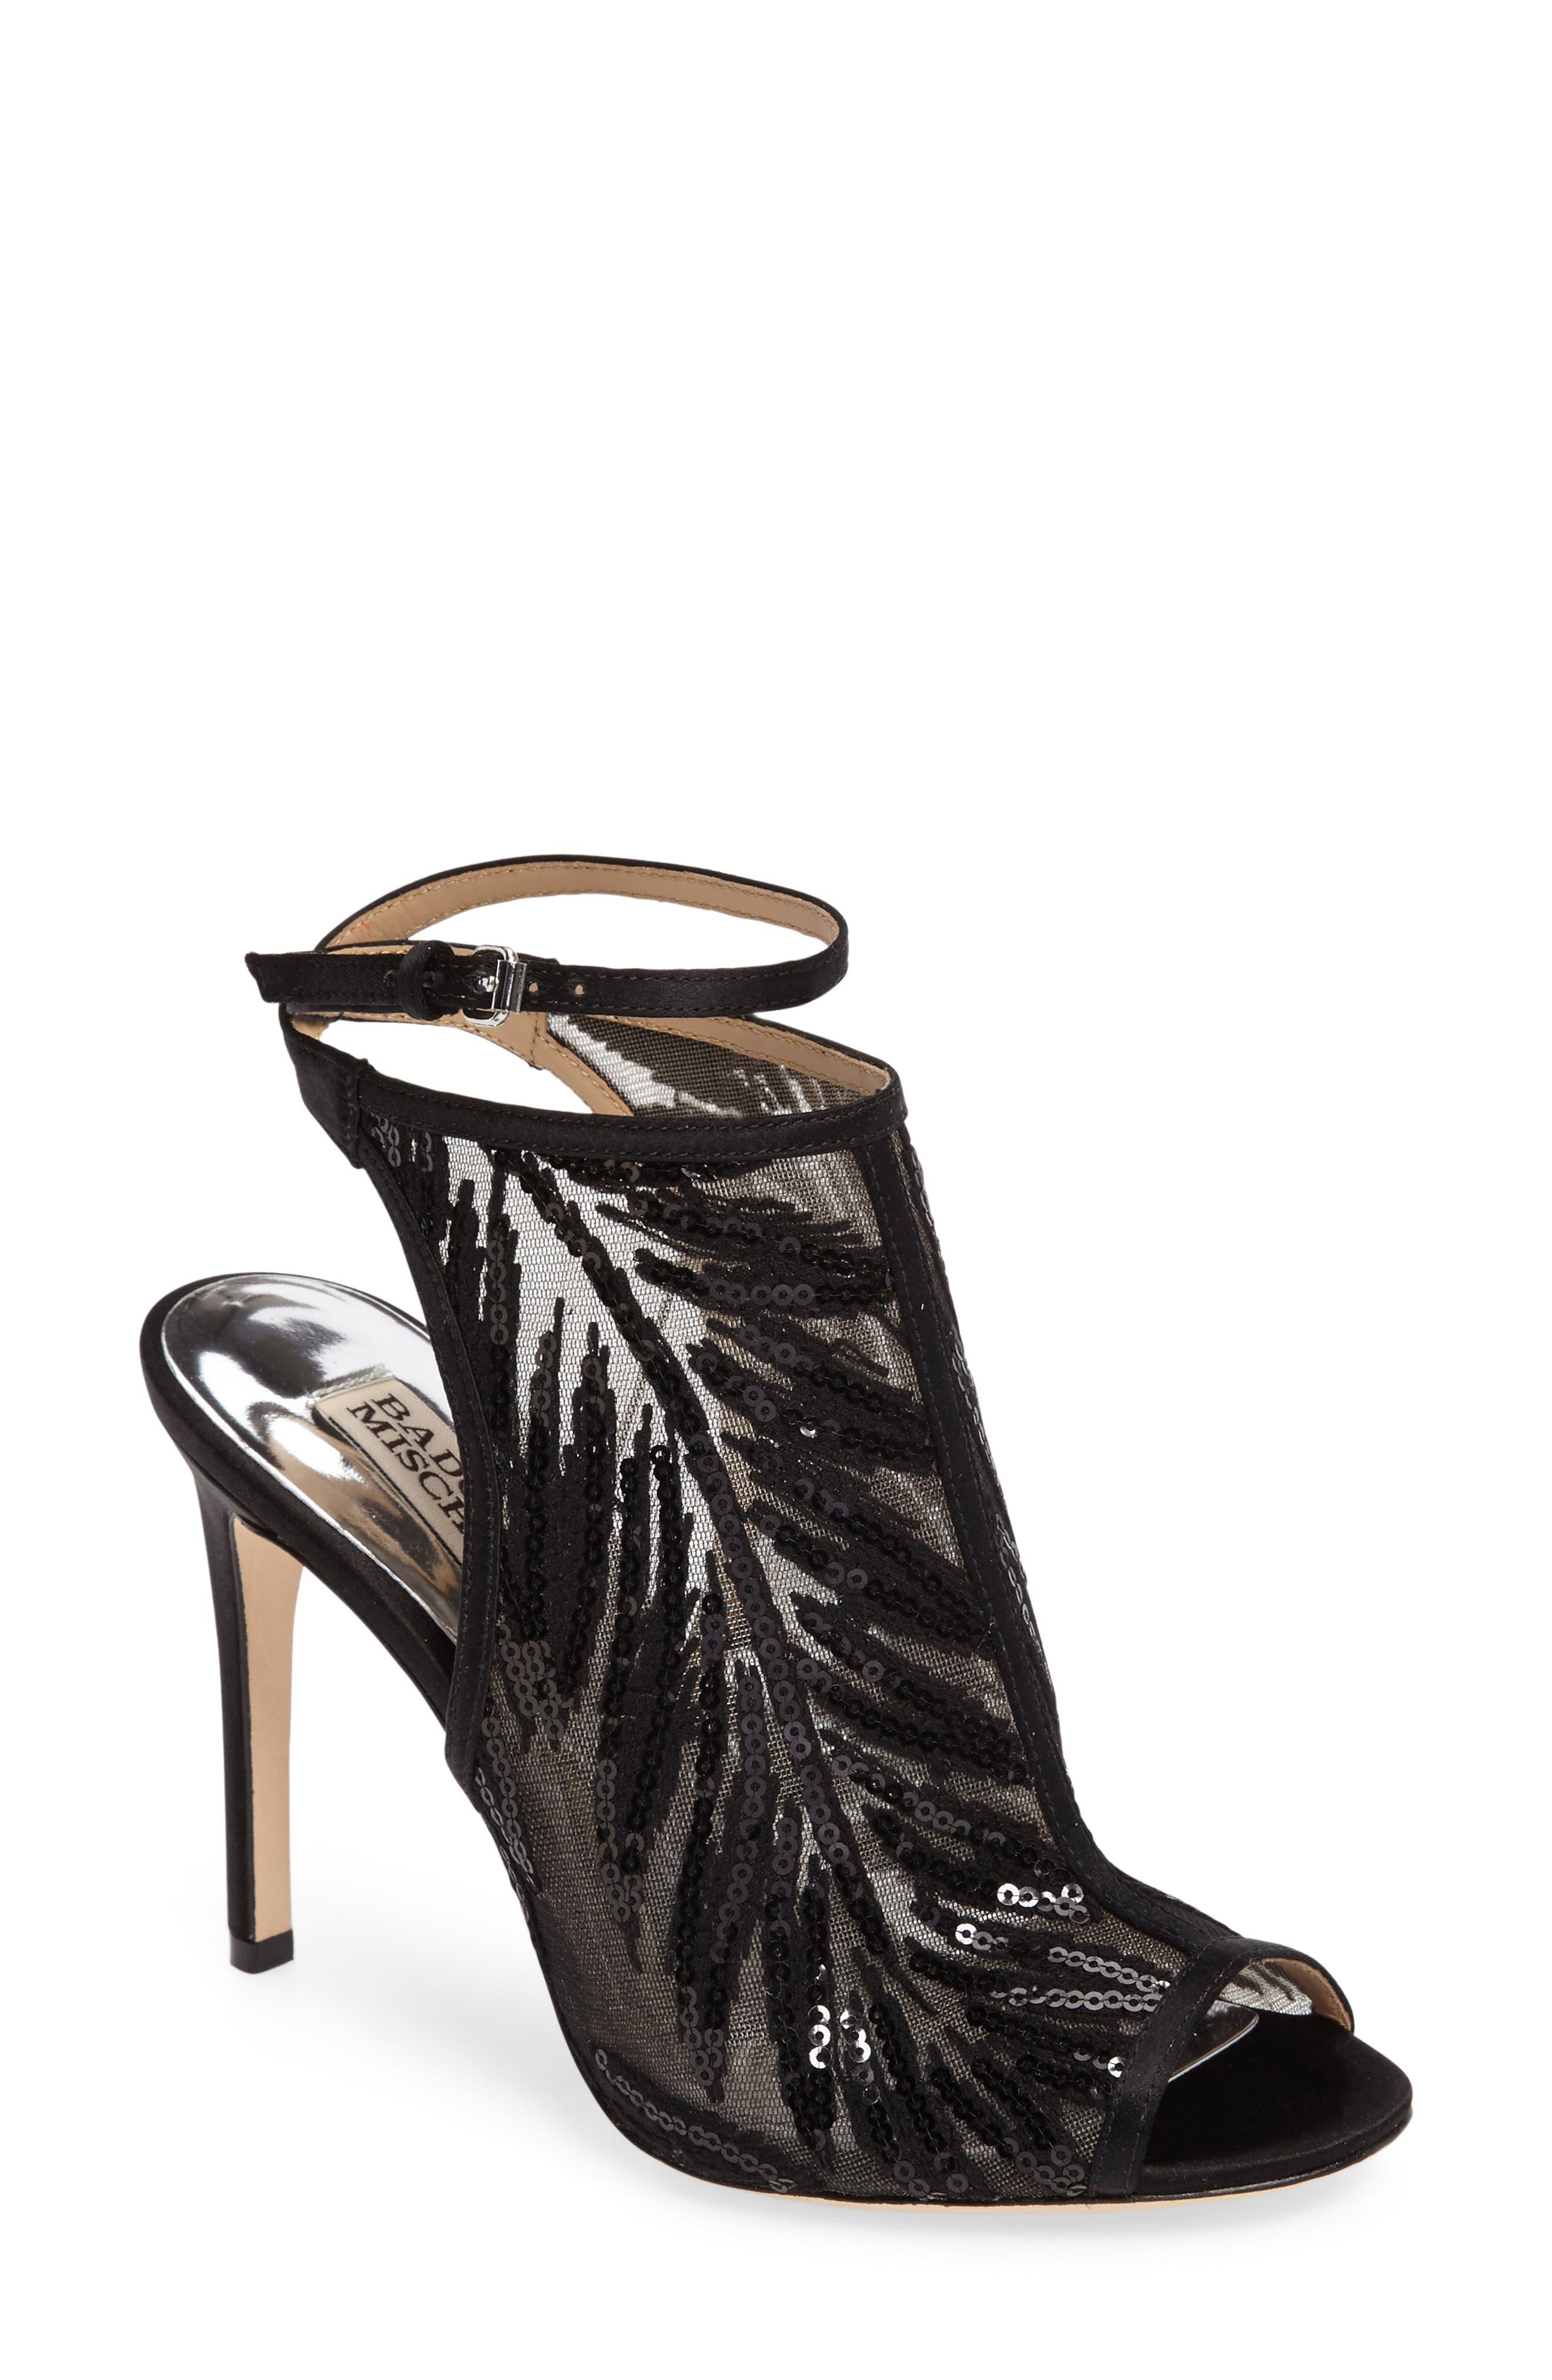 Main Image - Badgley Mischka Blakely Sequin Illusion Sandal (Women)